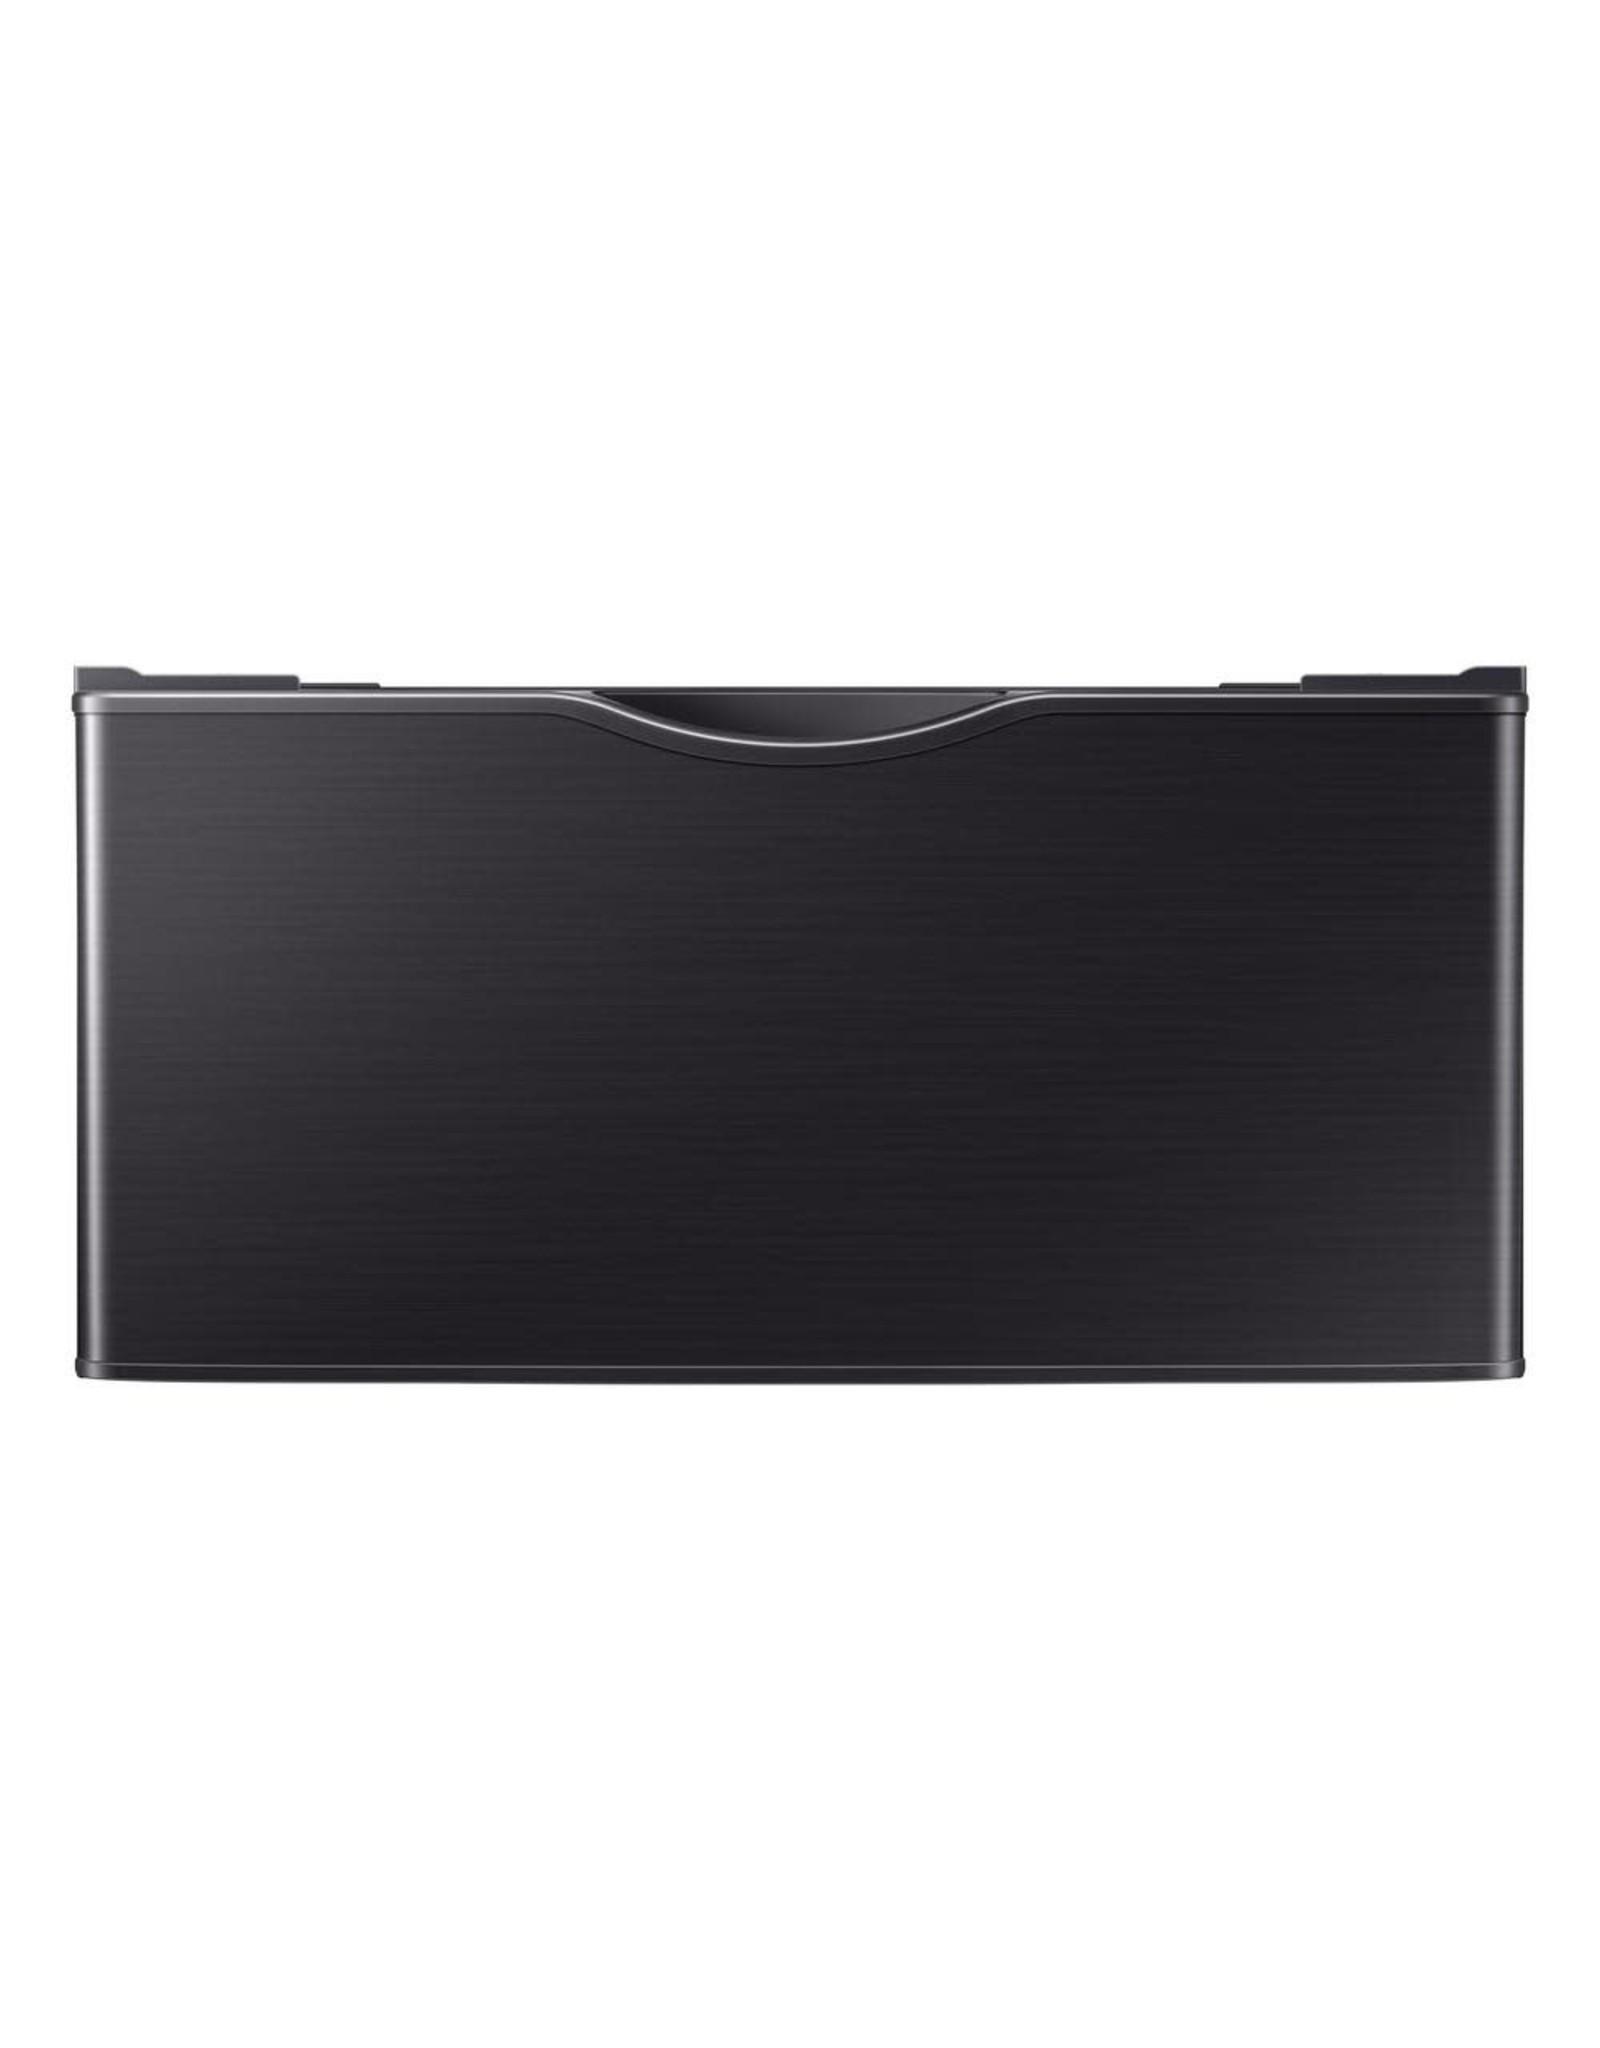 SAMSUNG WE402NV Samsung 14.2 in. Fingerprint-Resistant Black Stainless Laundry Pedestal with Storage Drawer